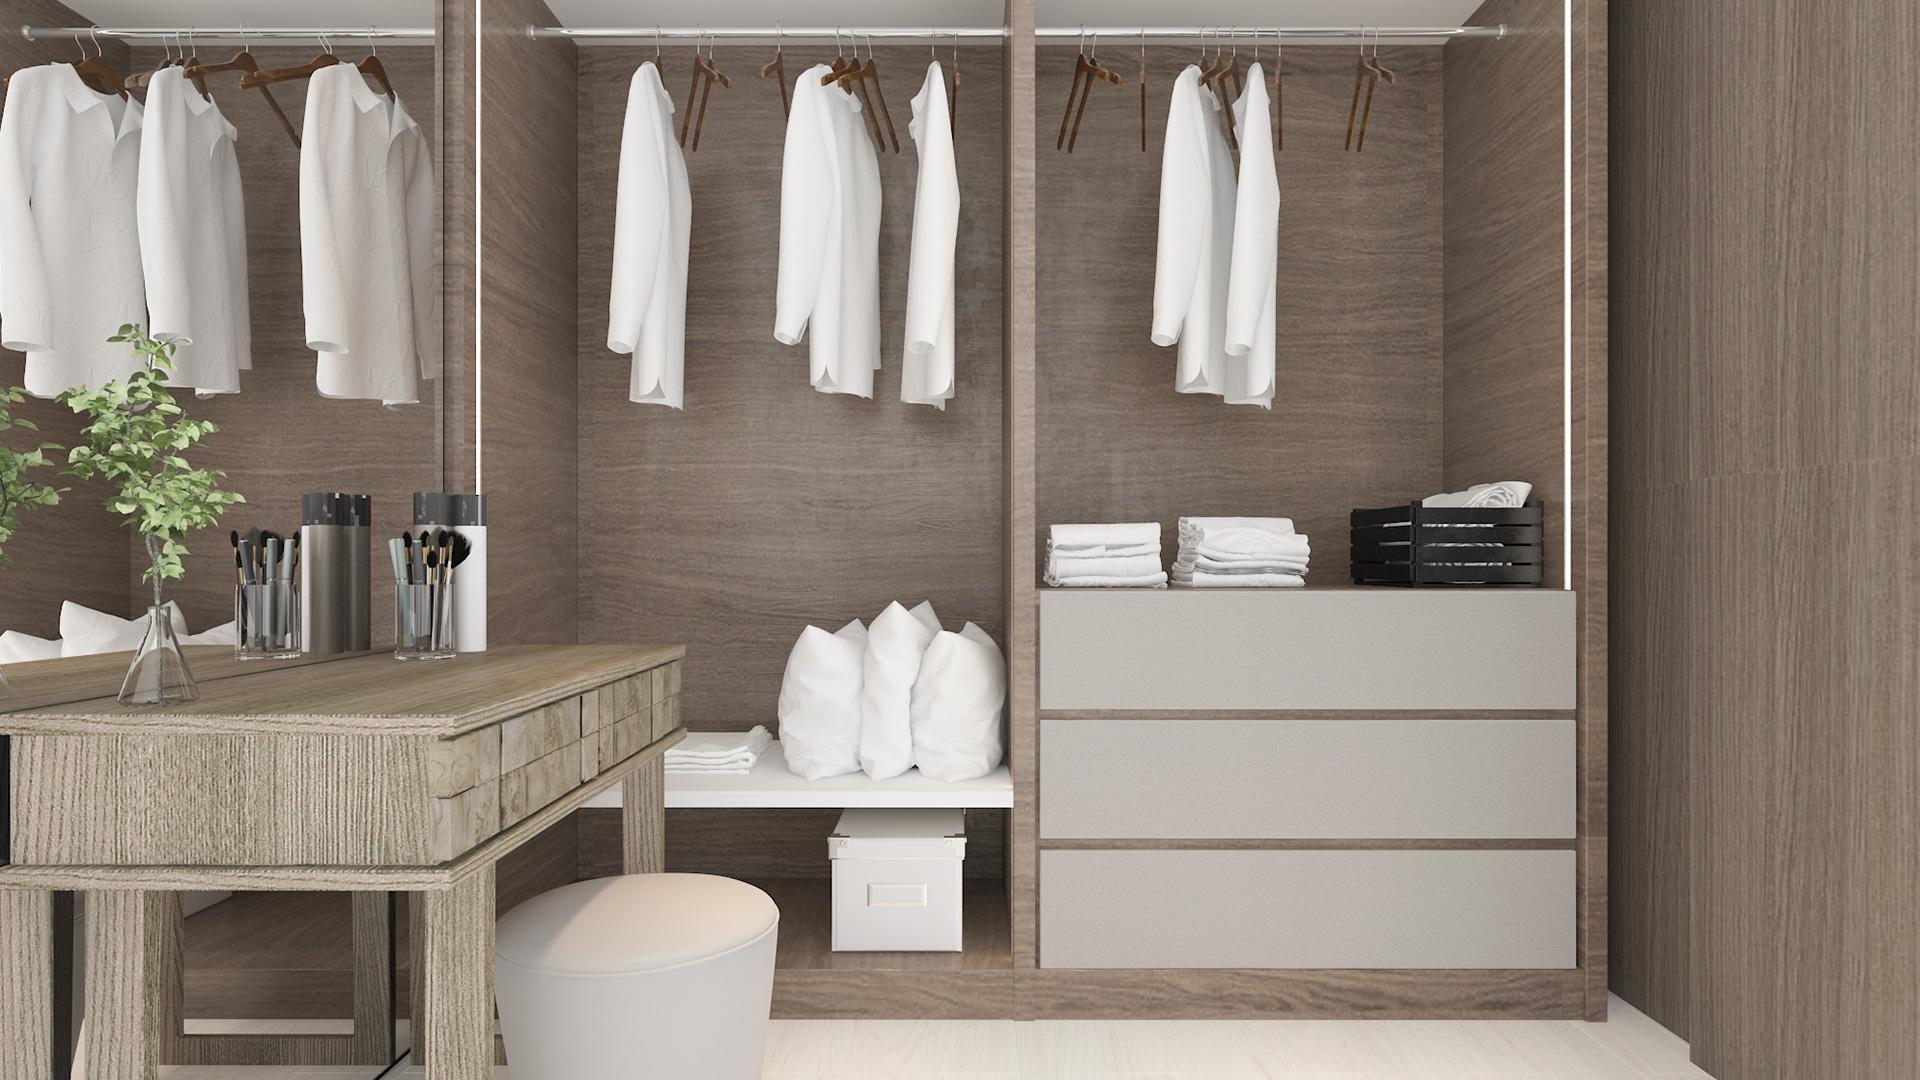 AlfaBangsar-apartment-wardrobe-02